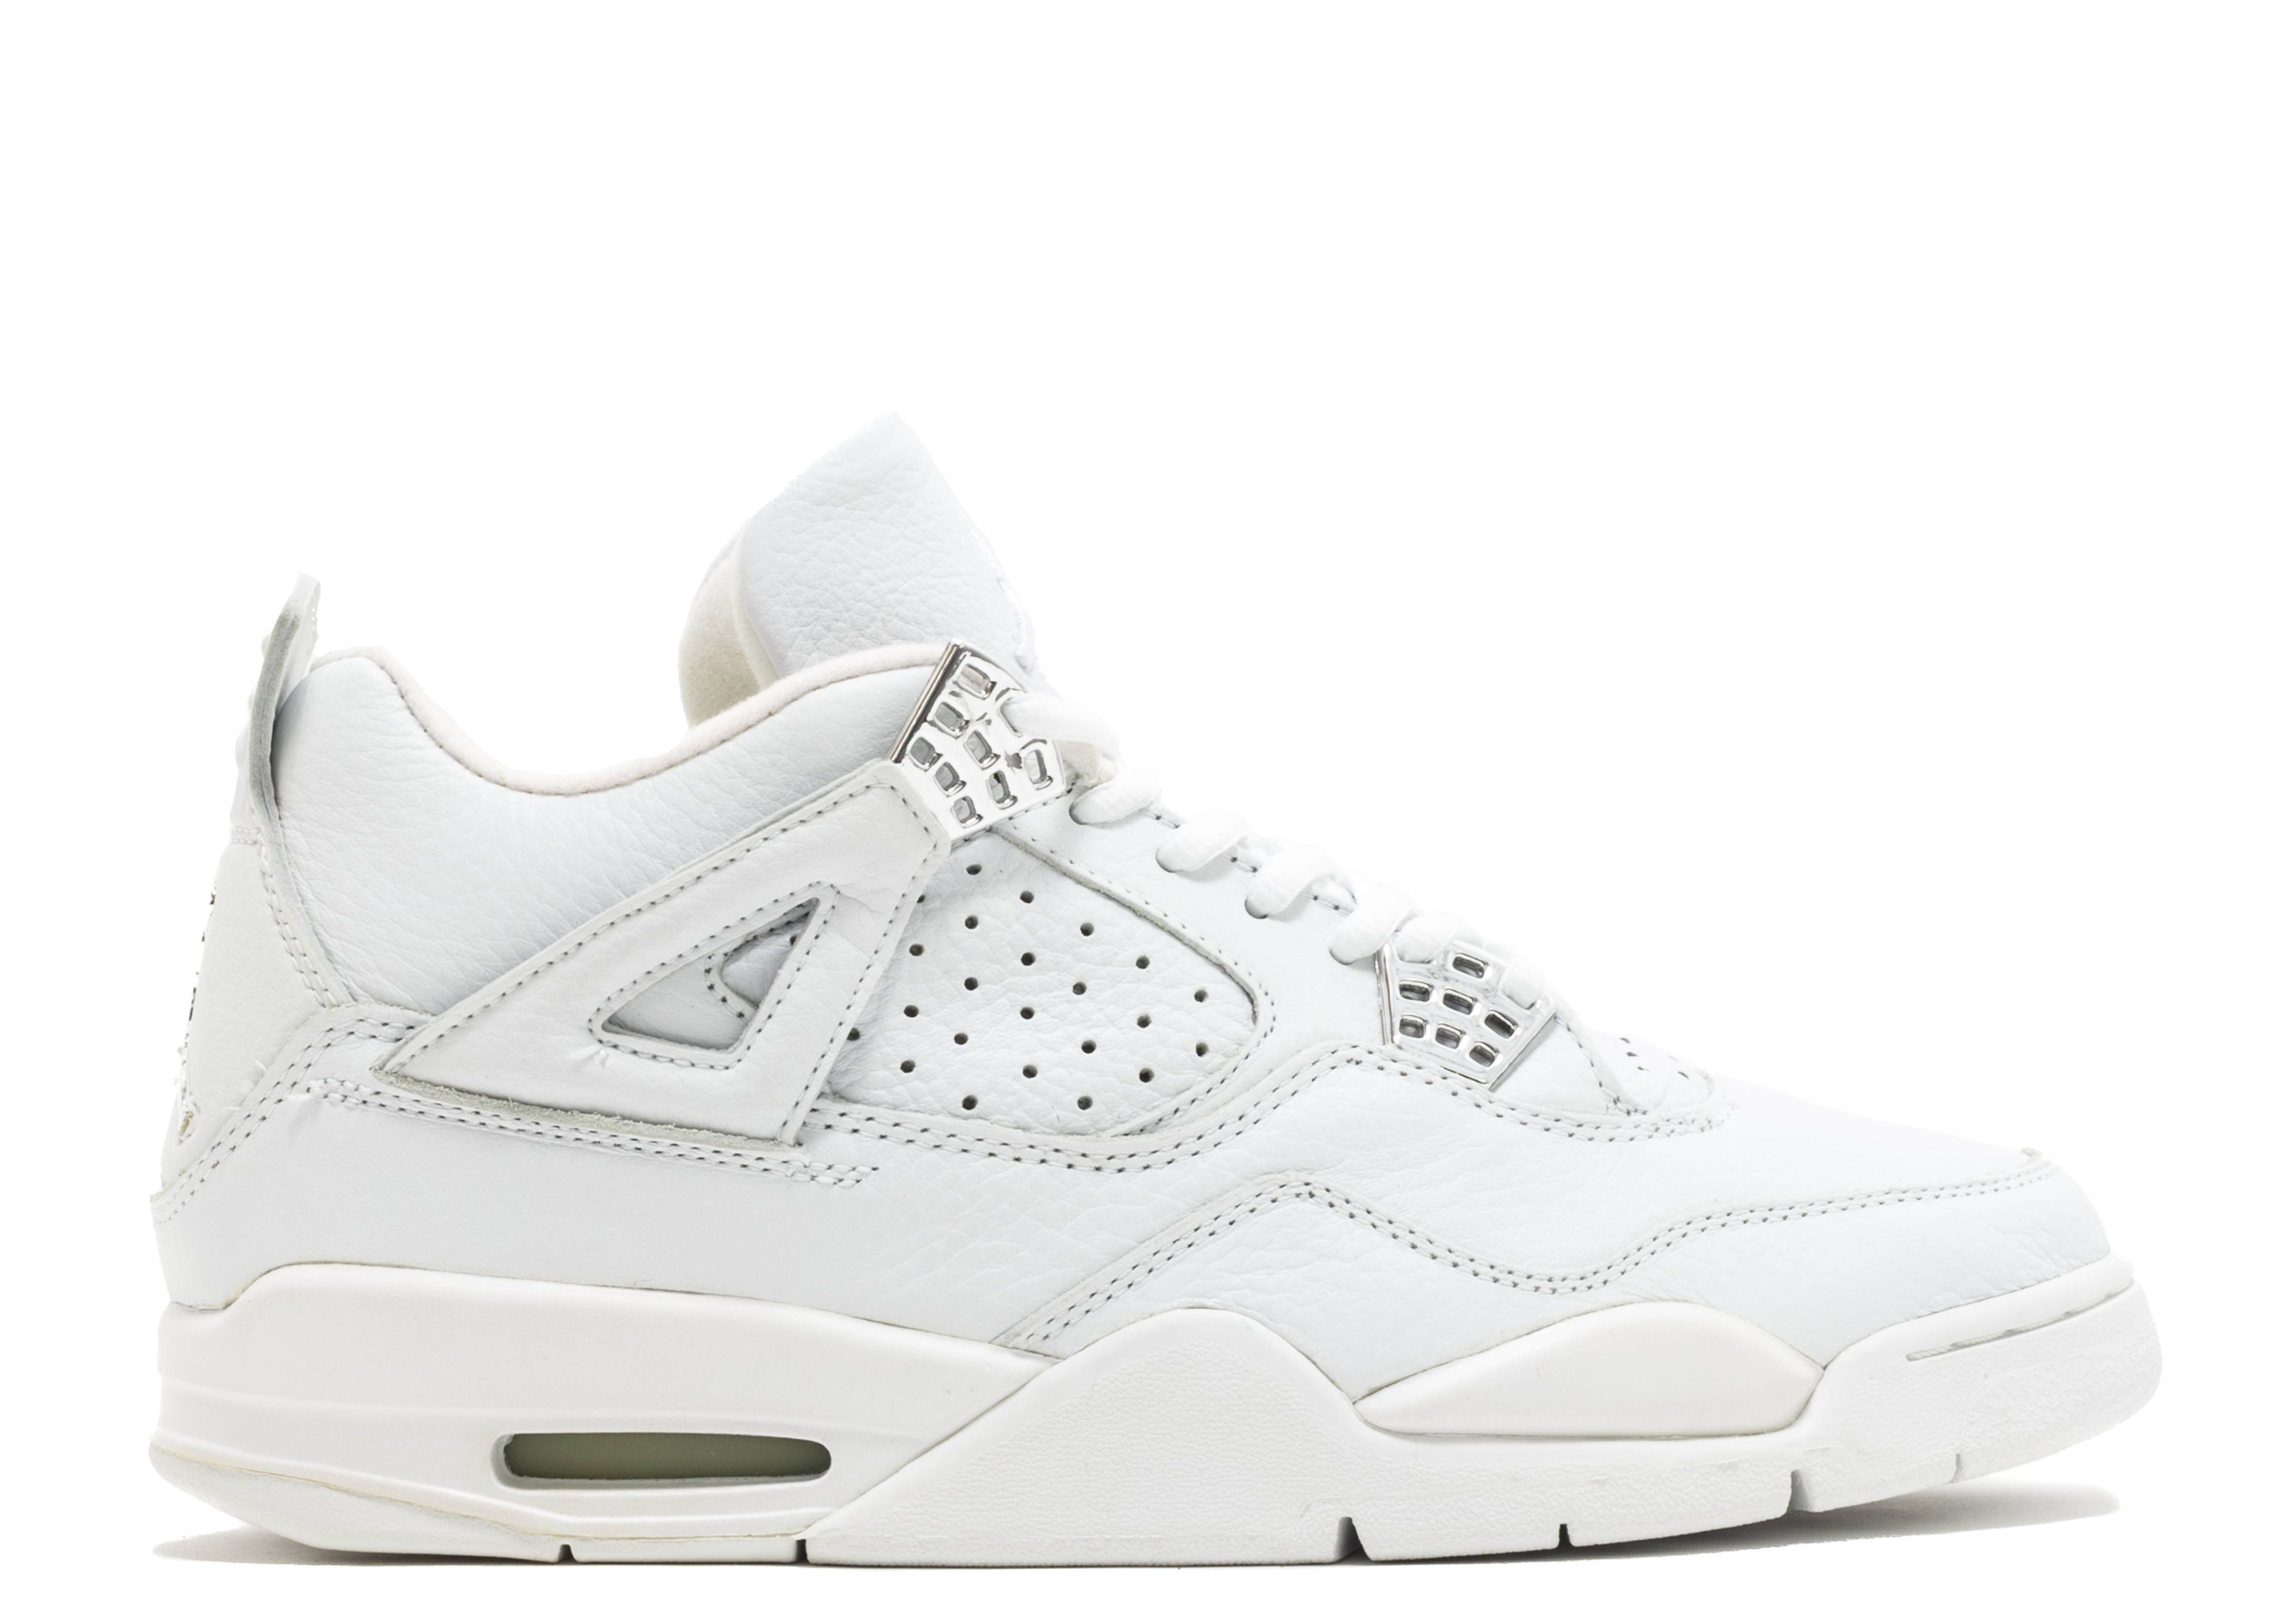 f3da2670726b33 Air Jordan 4 Retro + - Air Jordan - 136030 111 - white white-chrome ...